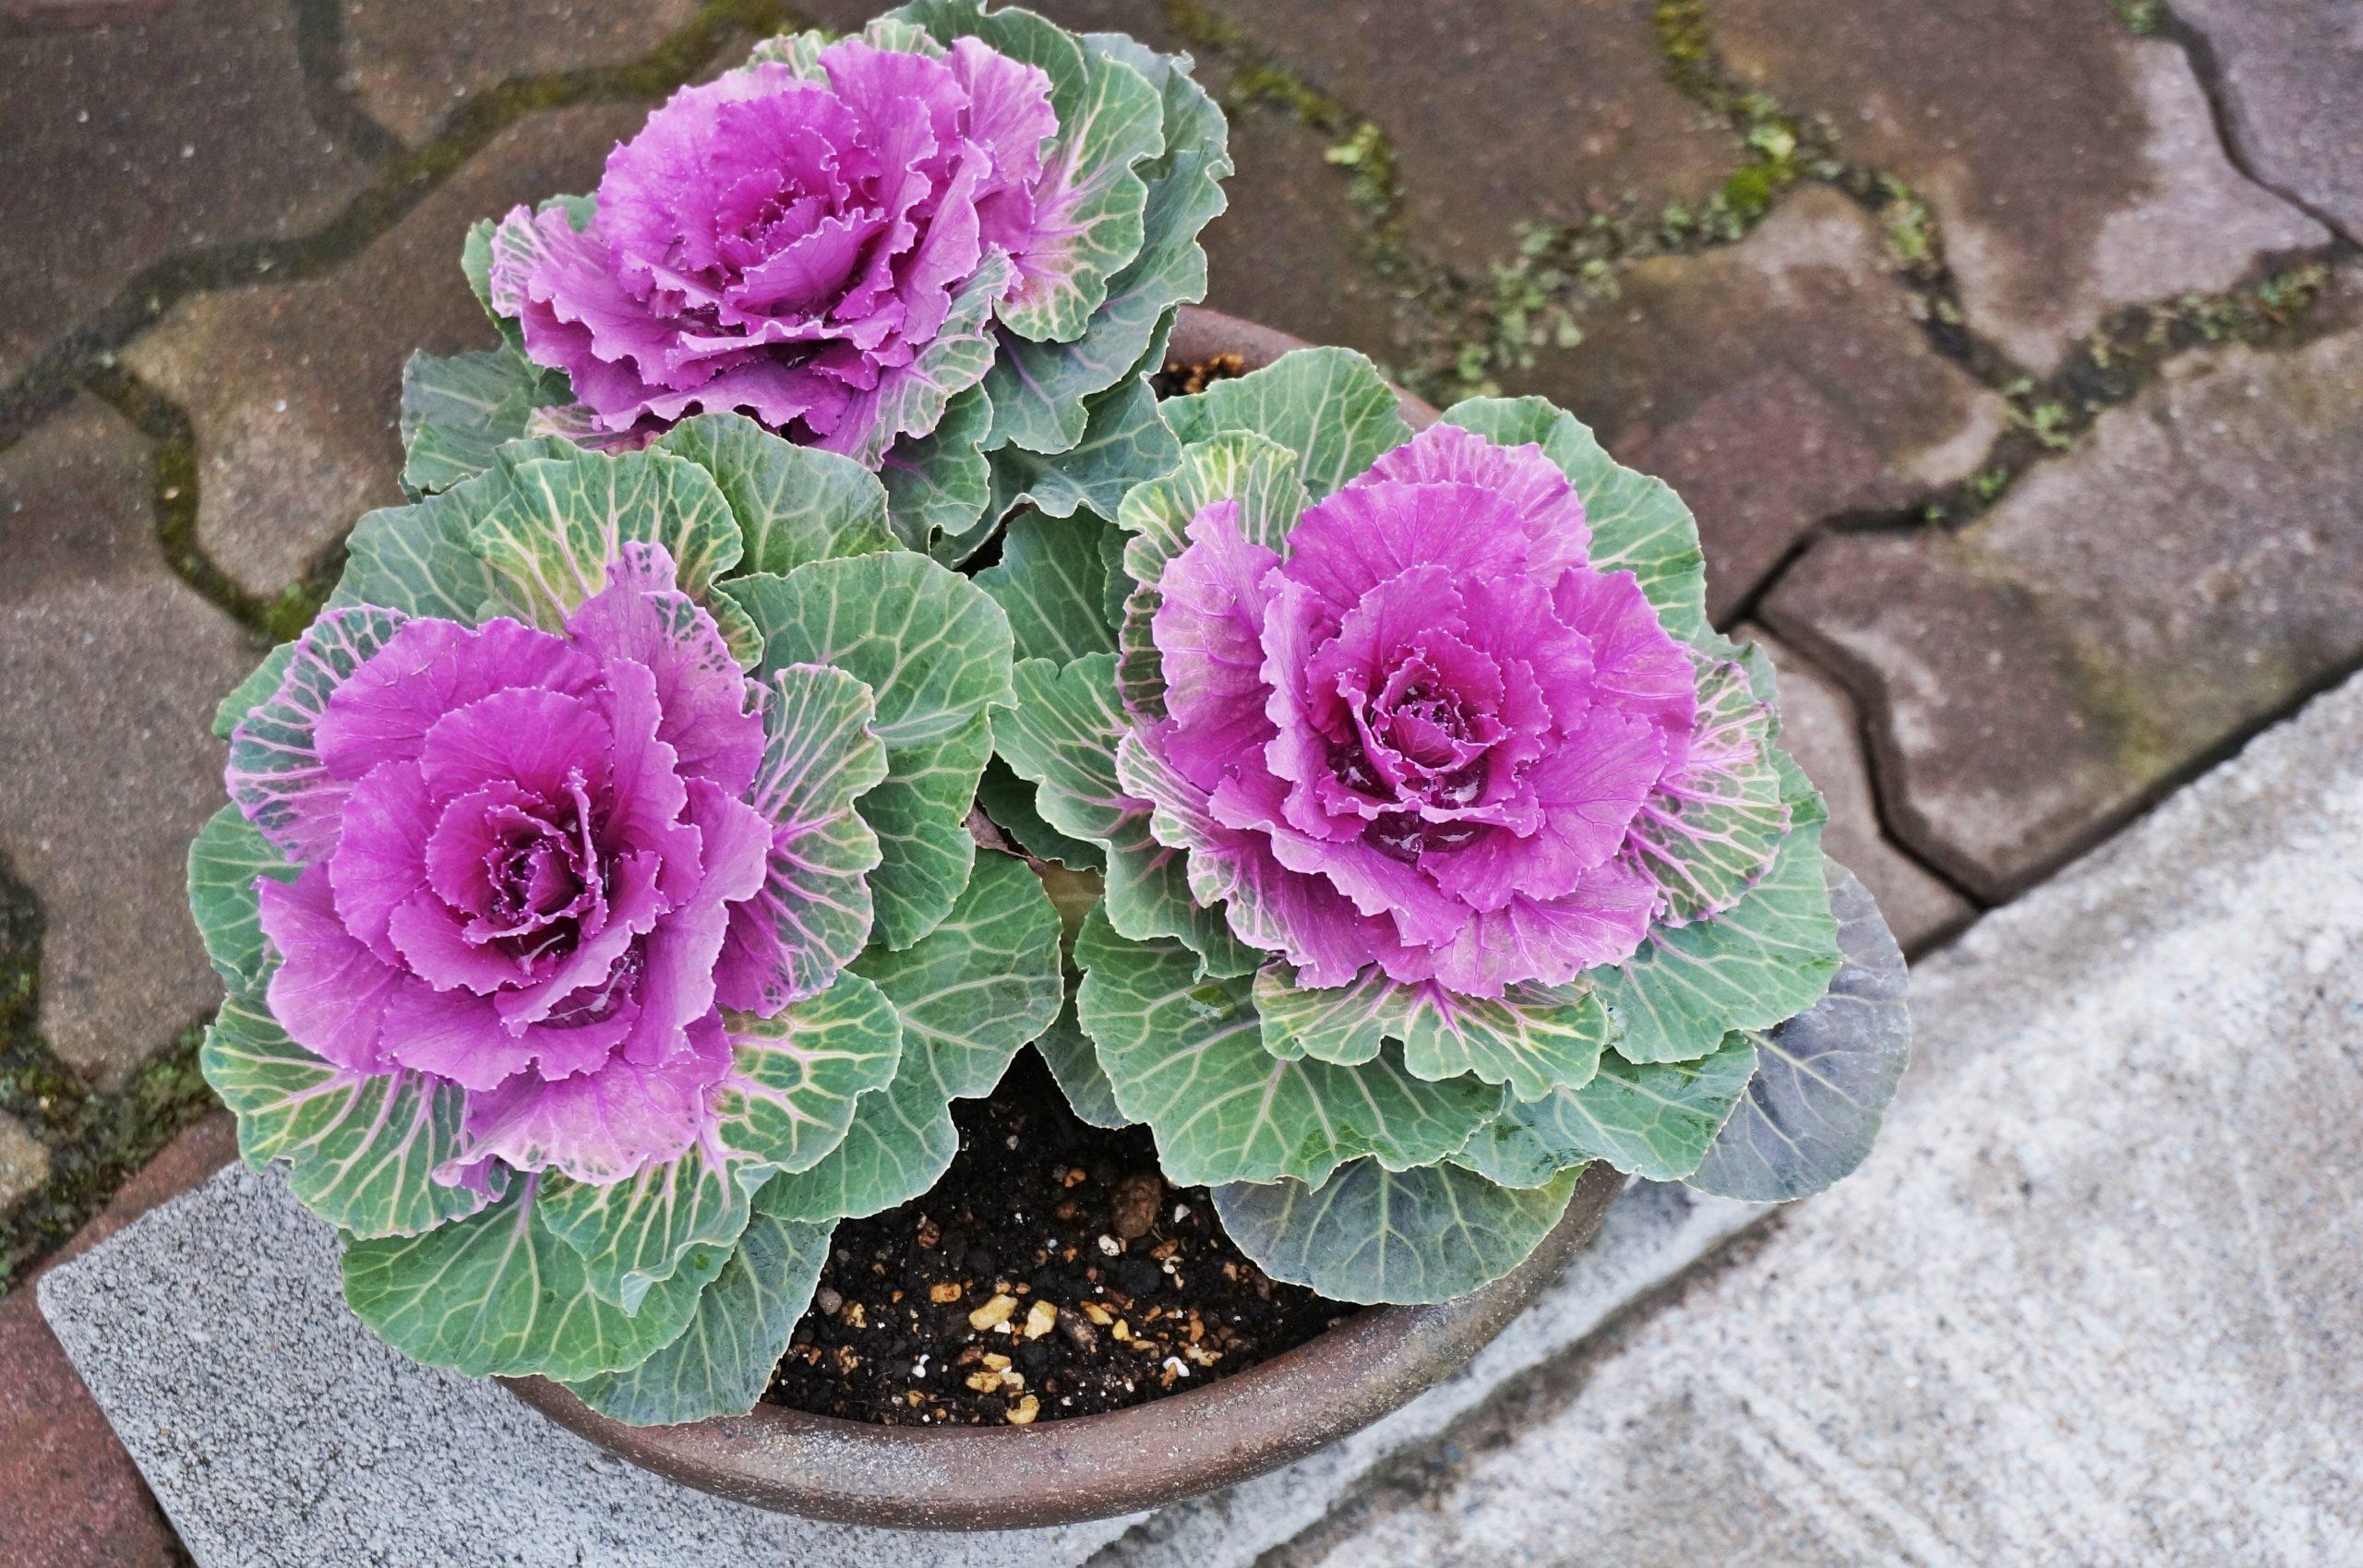 Close-up of flowering kale